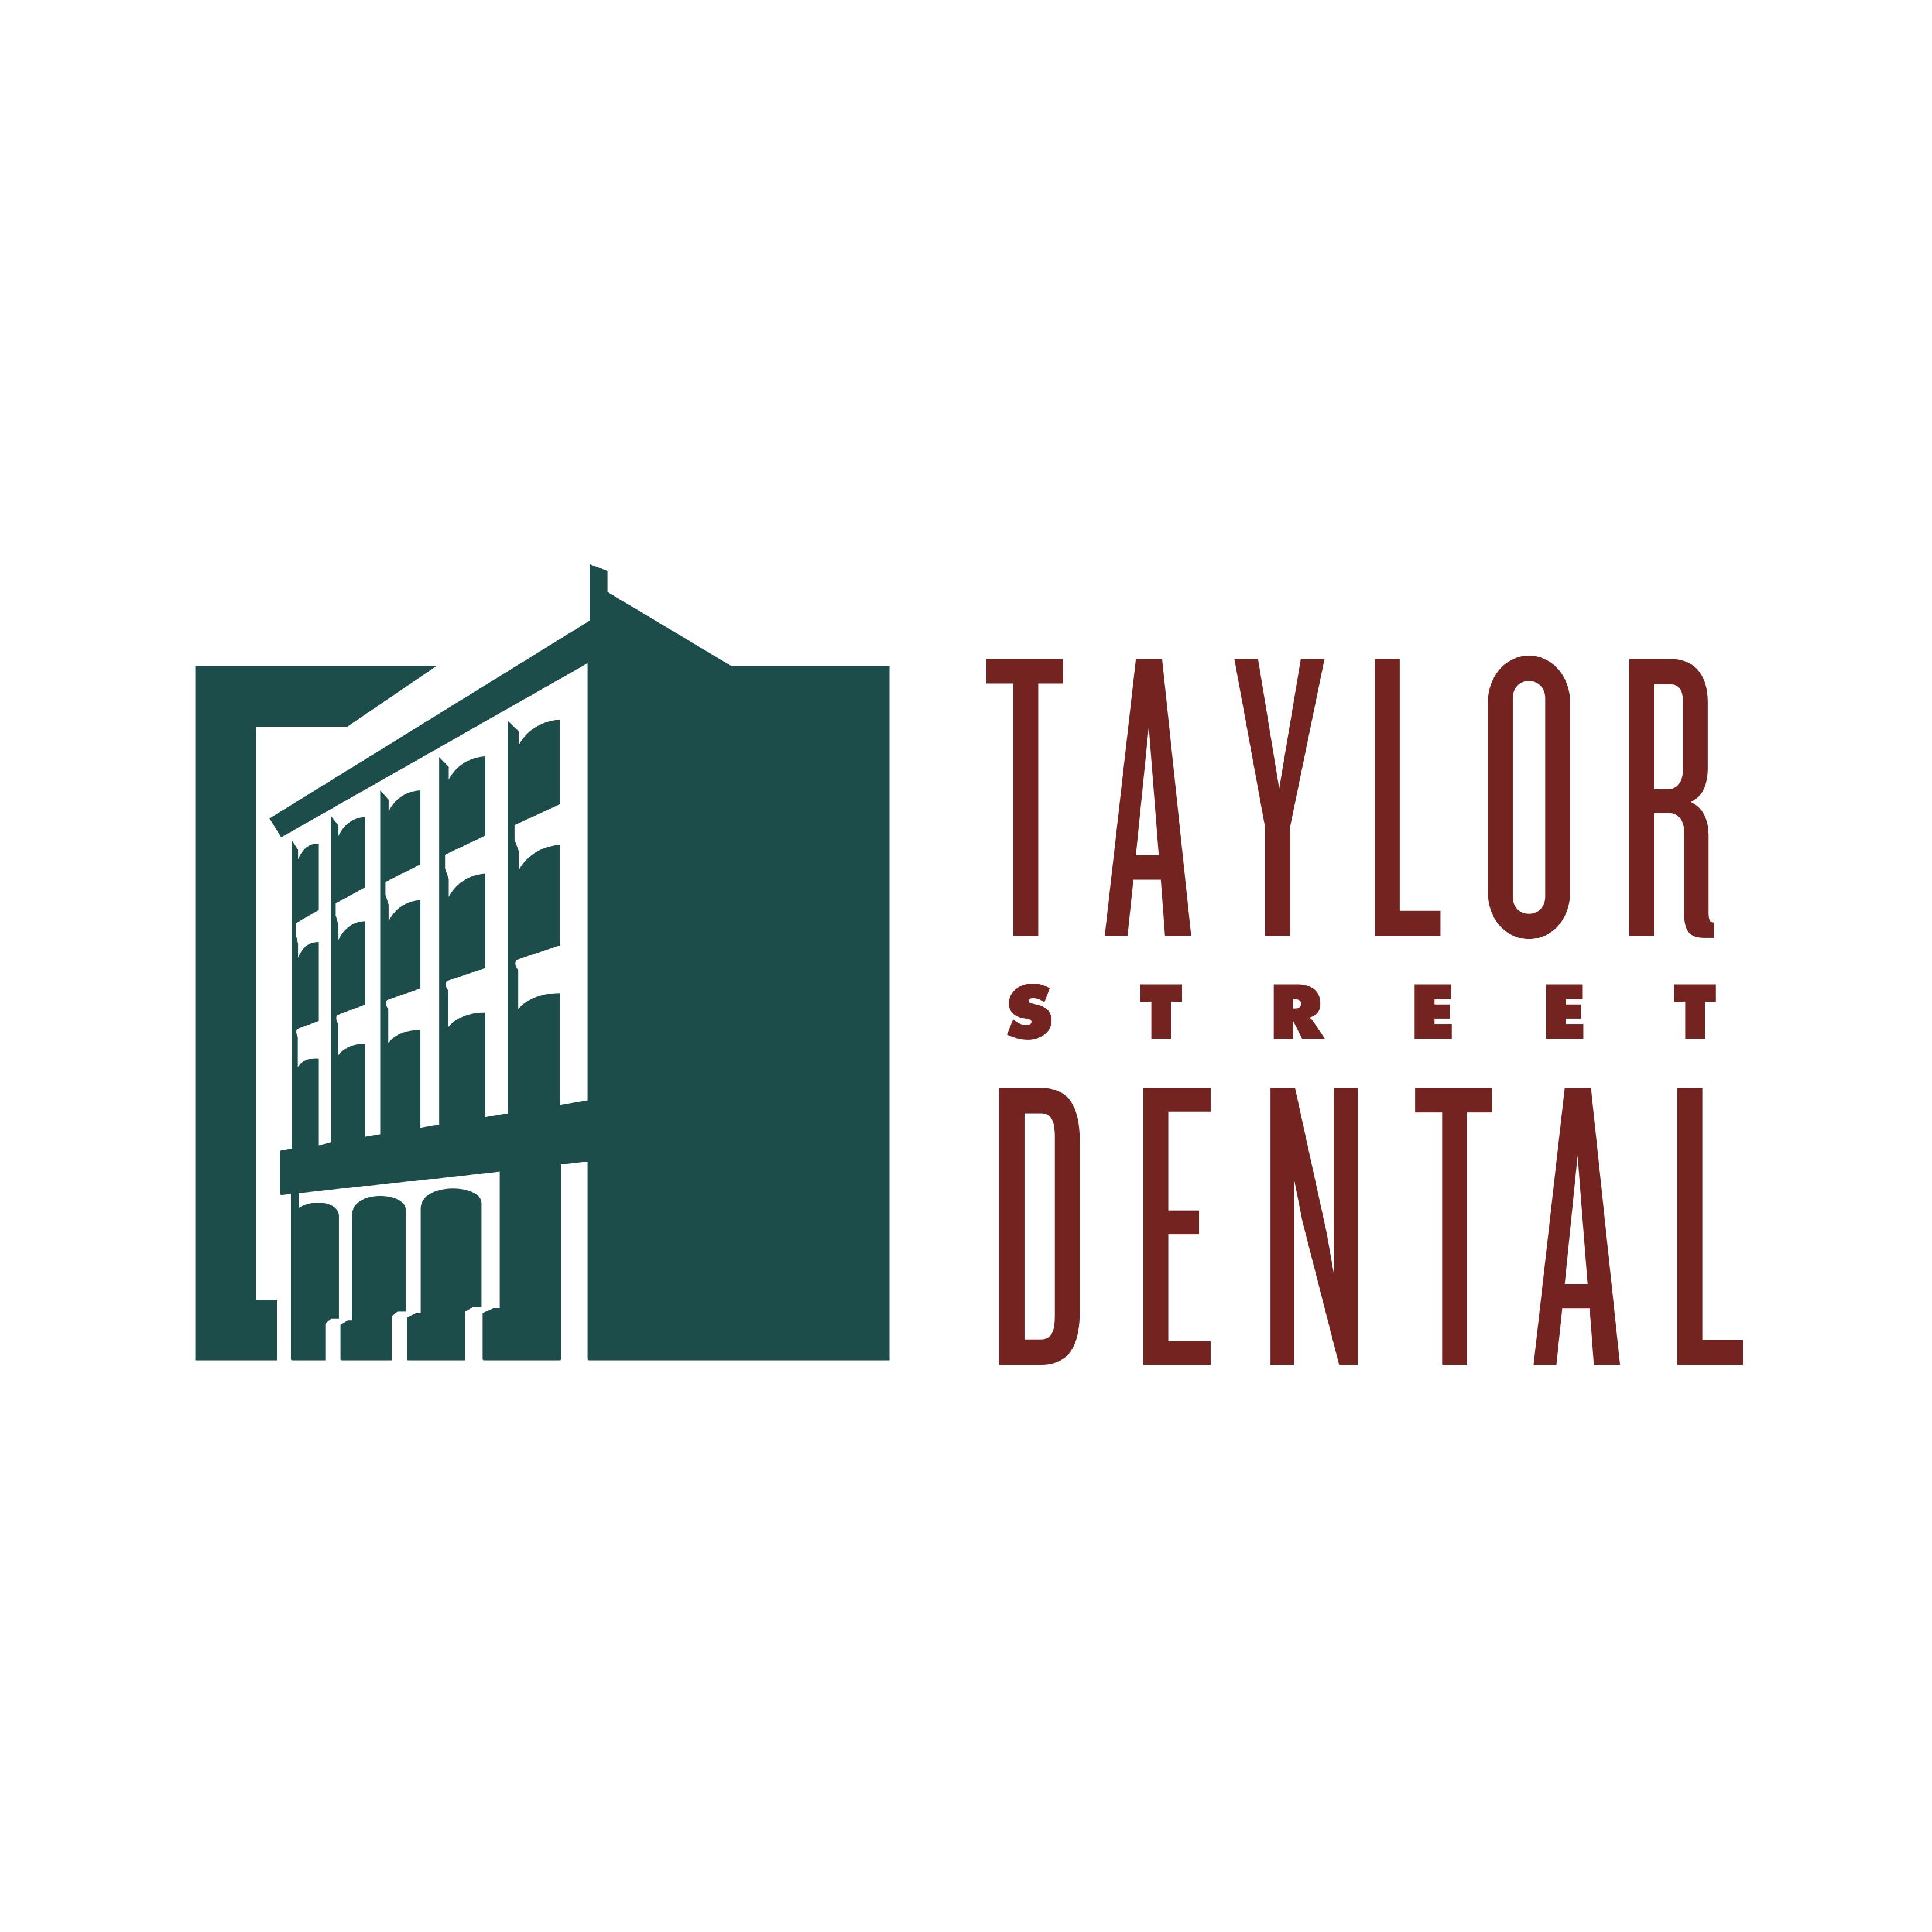 Taylor Street Dental